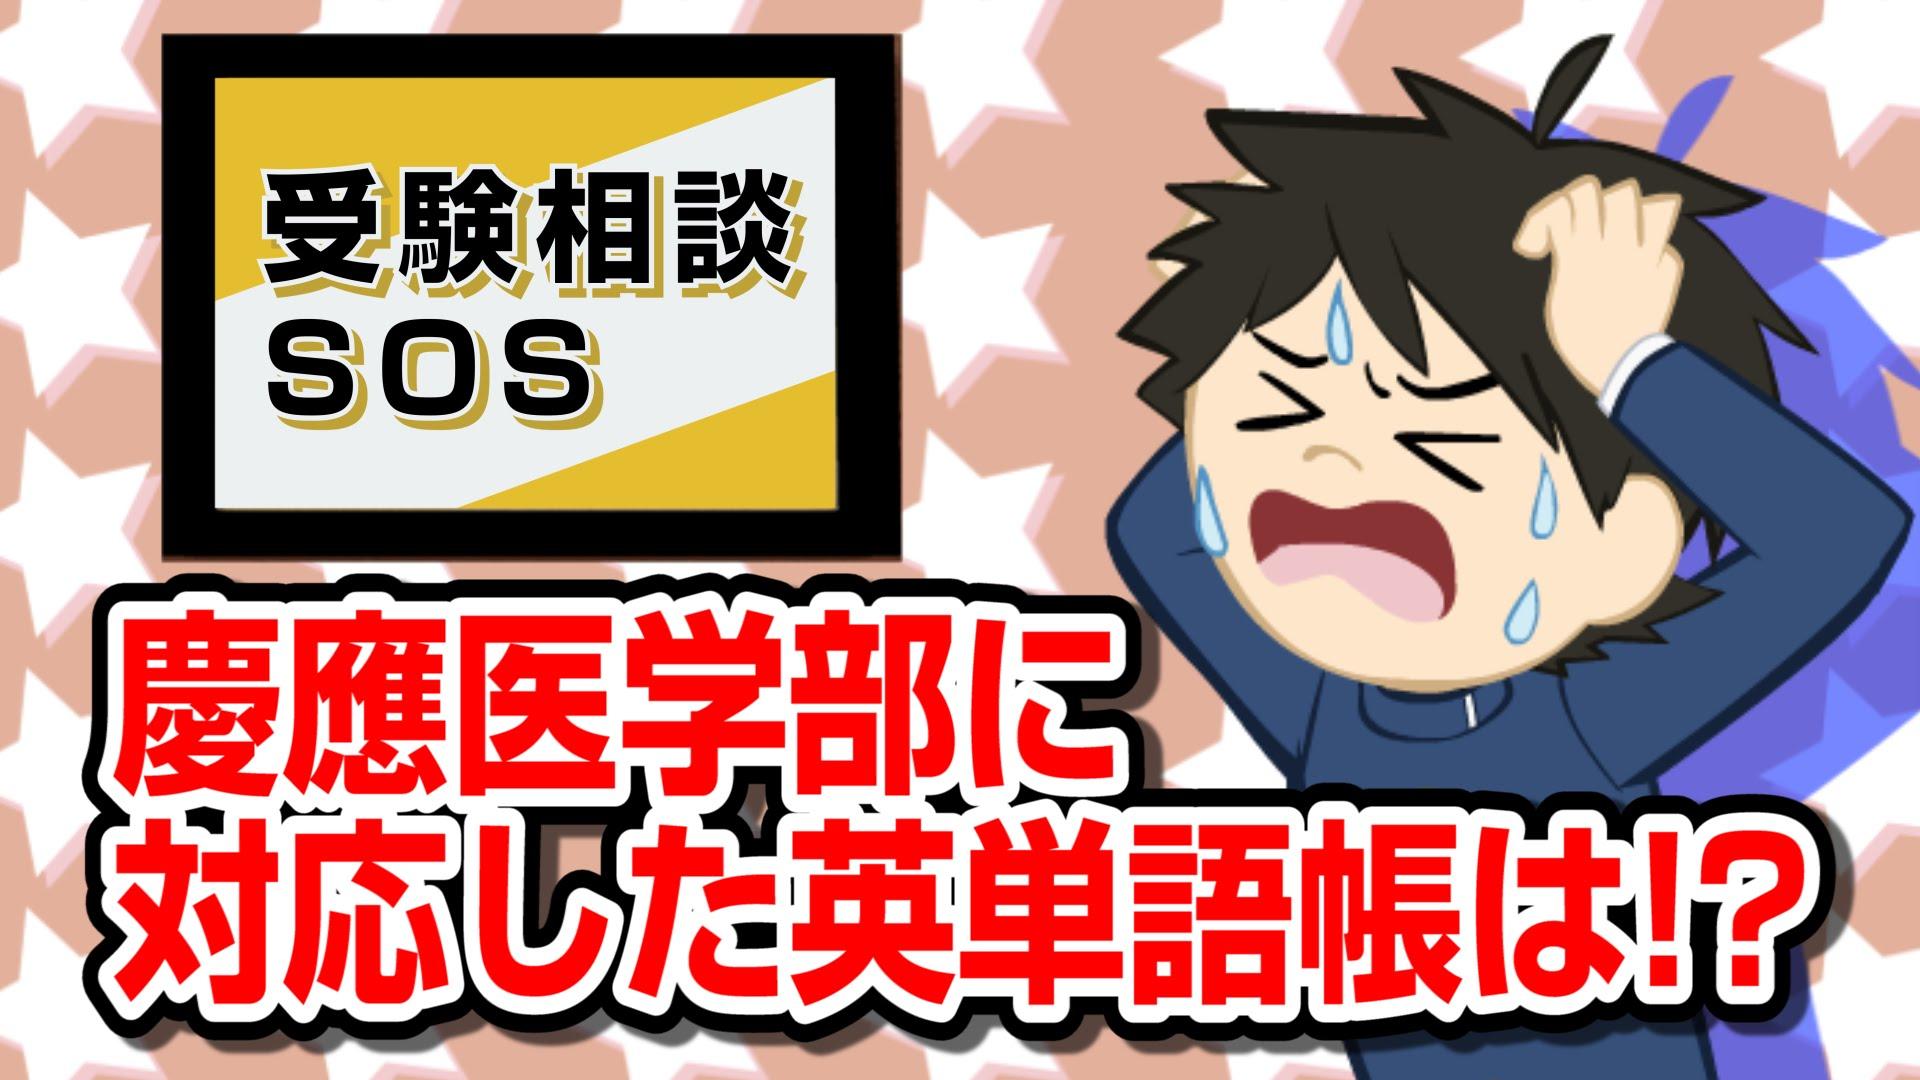 【vol.100】【100回記念!?】慶應医学部向けの英単語帳発表! 受験相談SOS